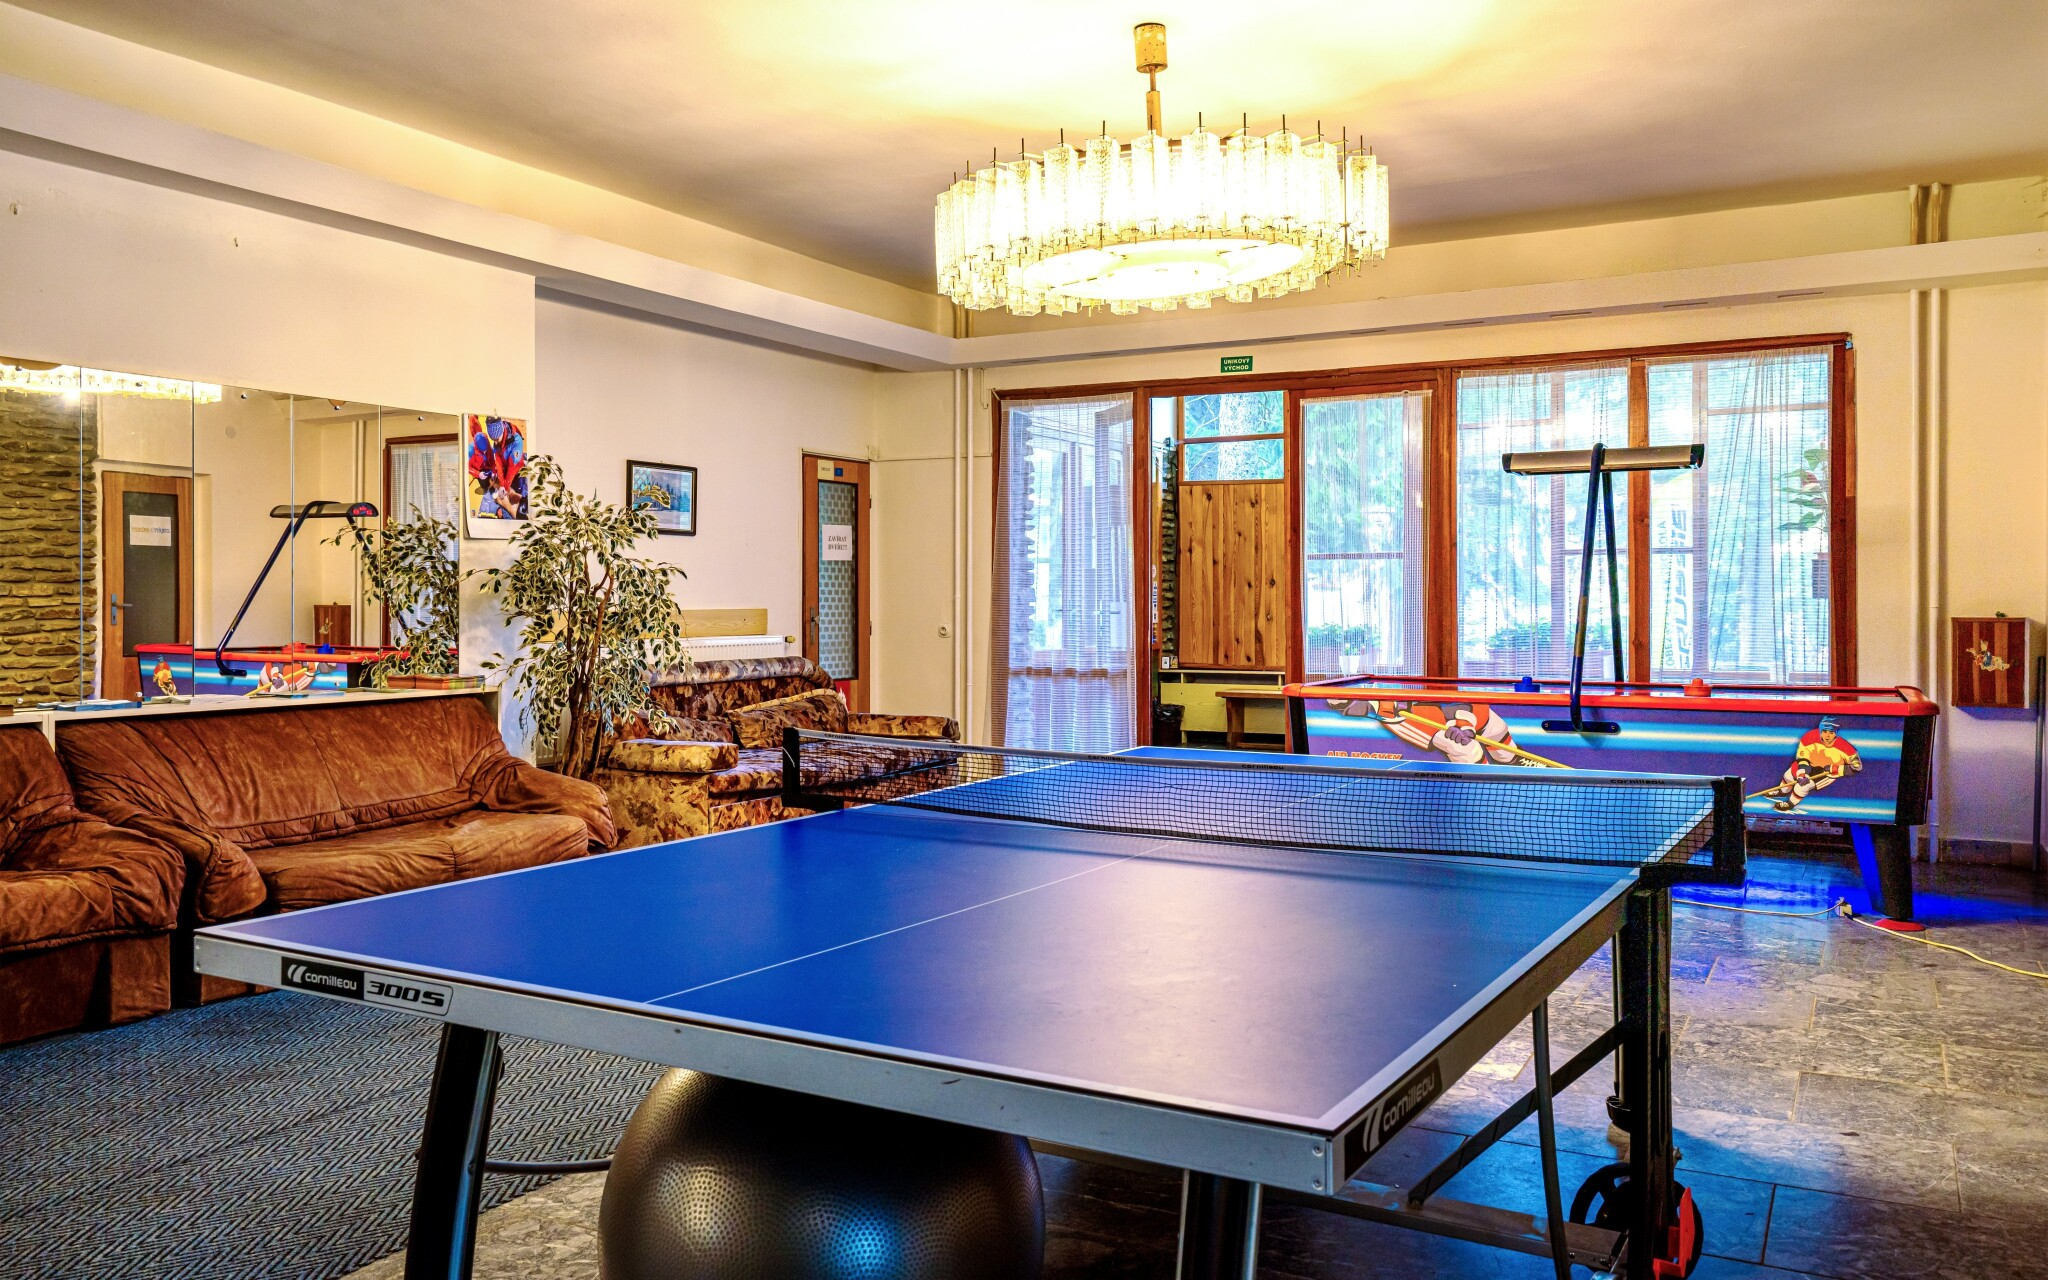 Zahrajte si stolní tenis, Hotel Stella, Šumava